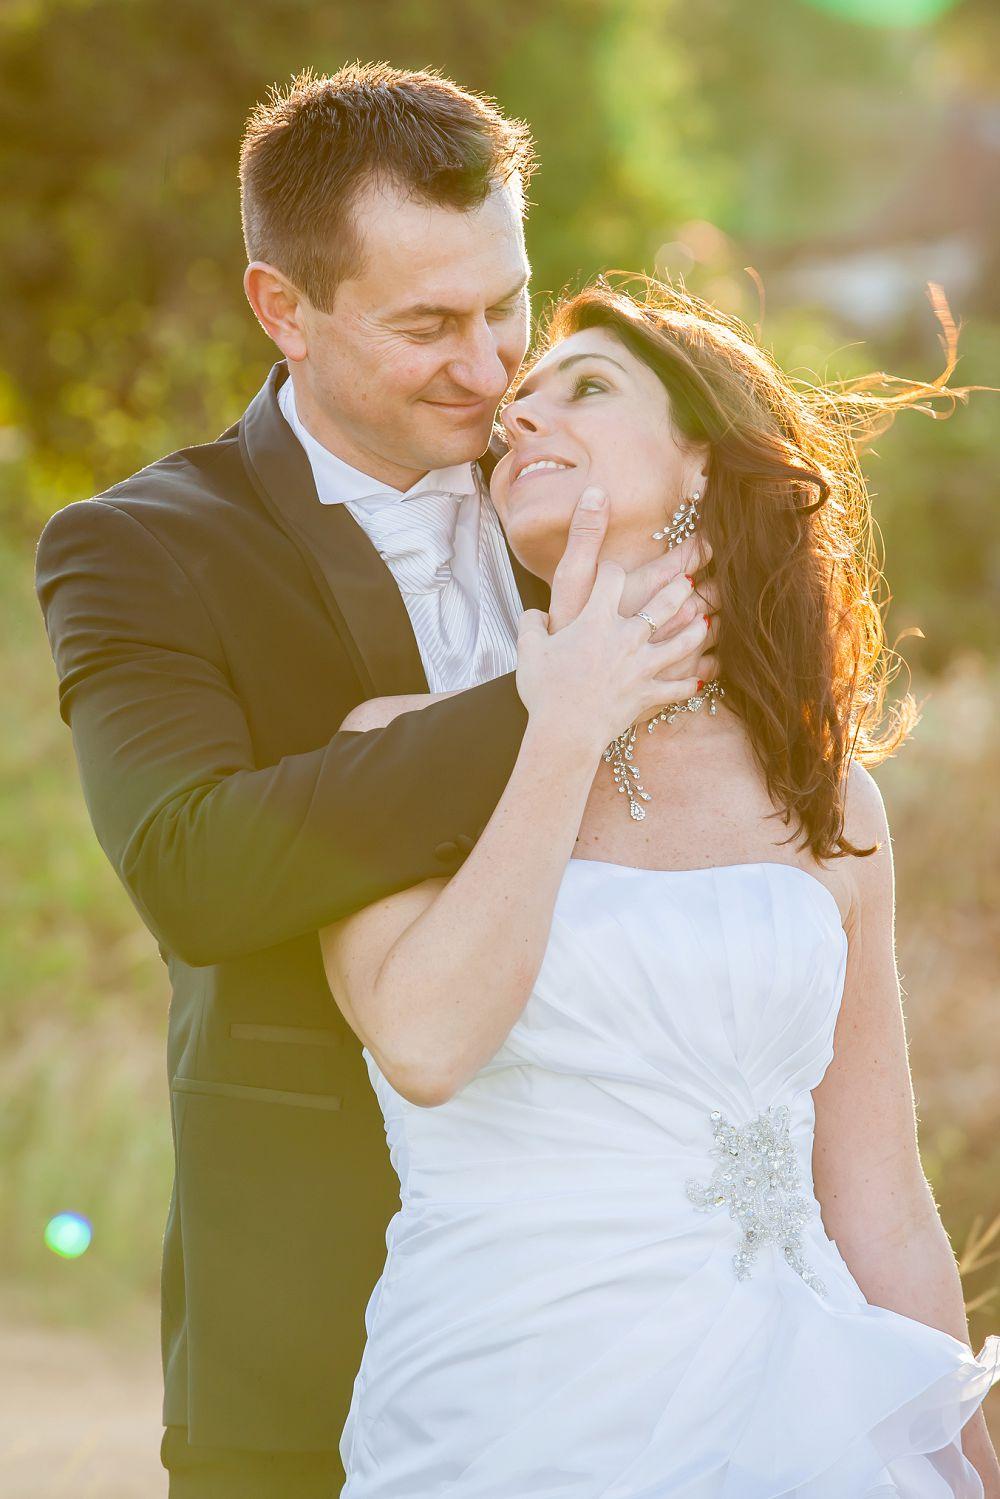 De Malle Meul Wedding Expressions Photography070